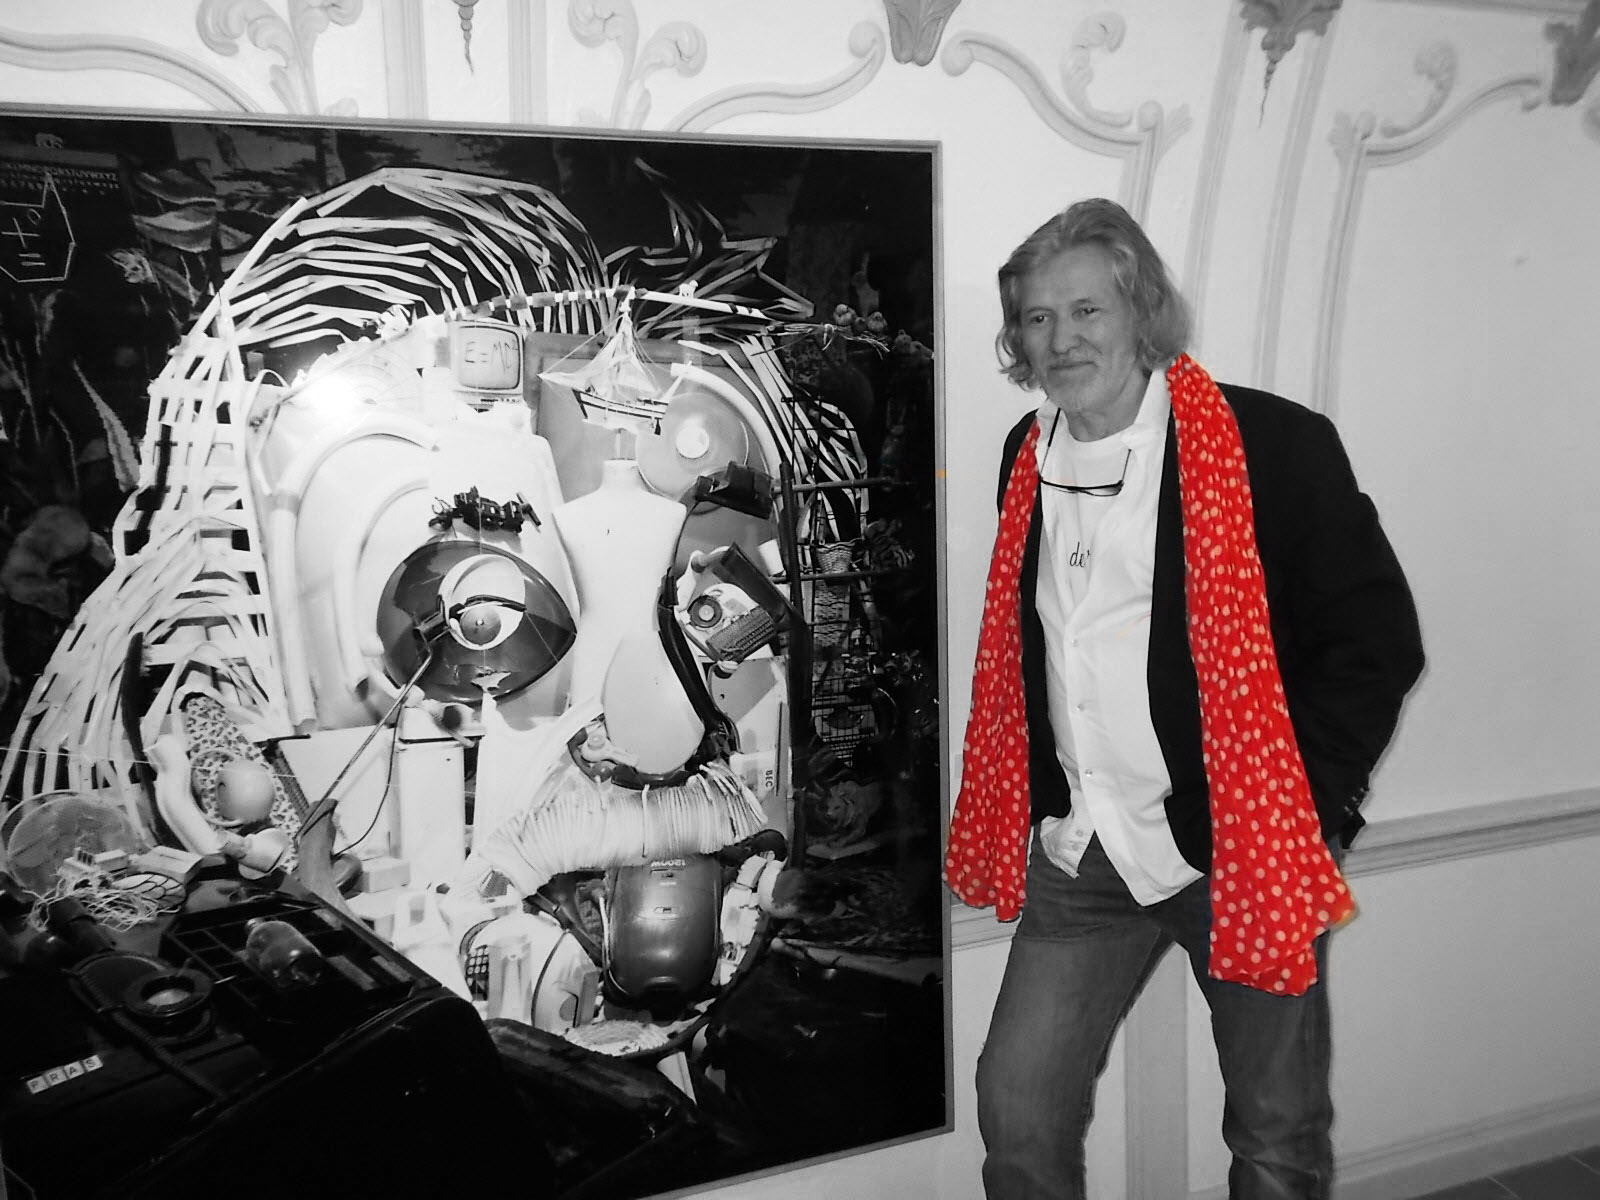 FABRICANTE FABRICARUM: француз Бернар Пра, создающий шедевры из НИЧЕГО, добрался до Мунка и Тараса Шевченко